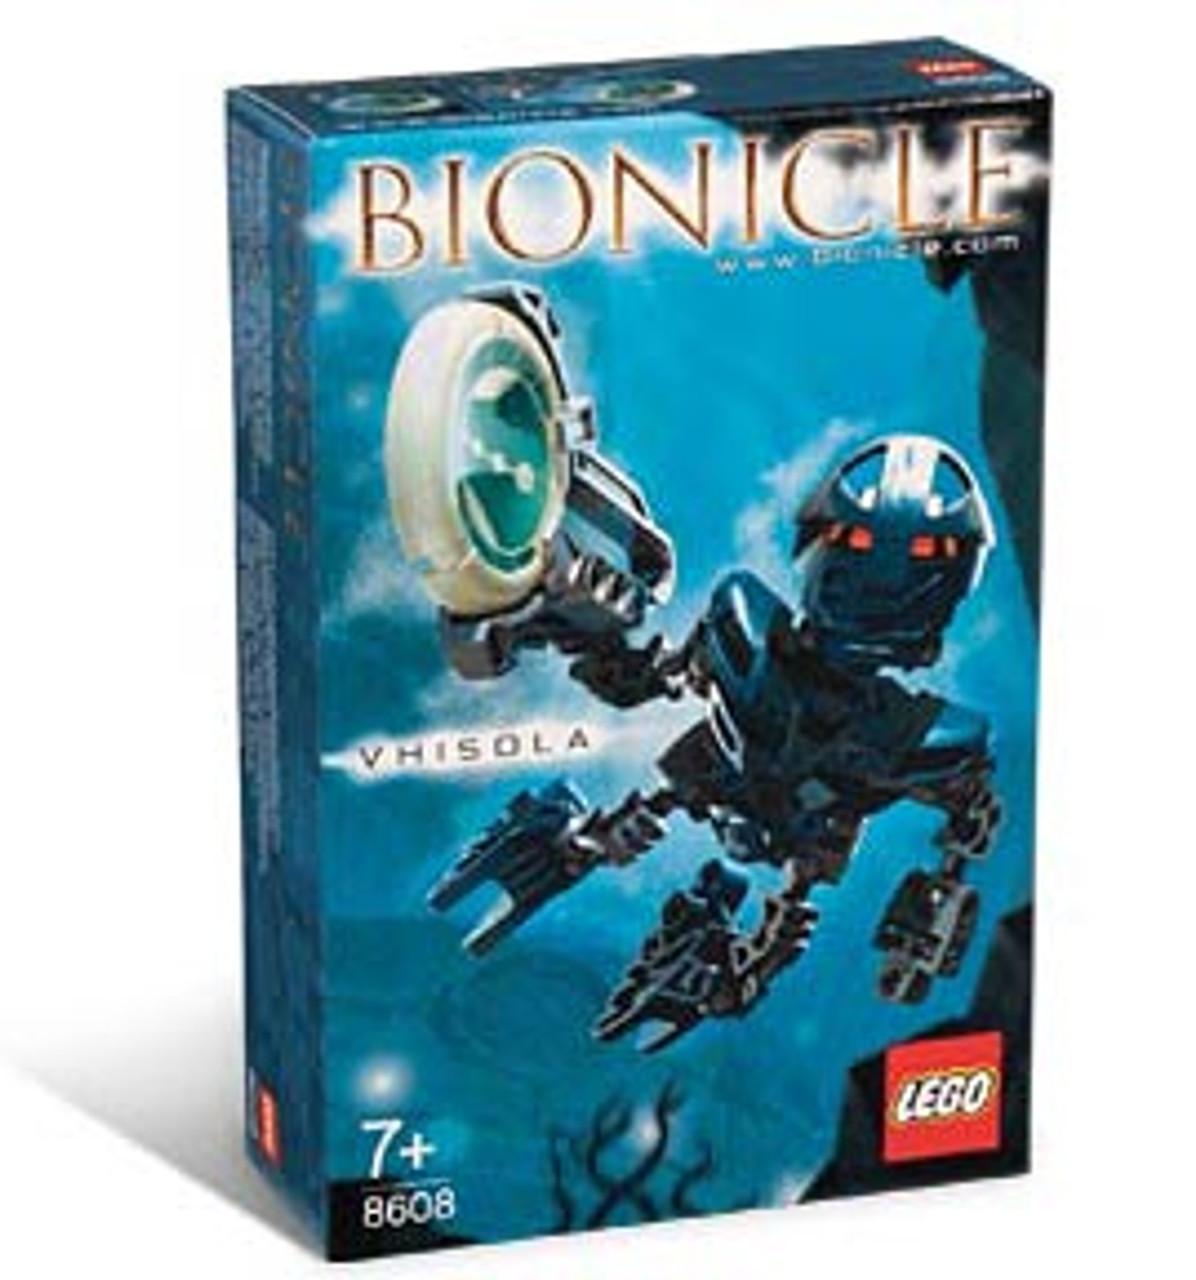 LEGO Bionicle Matoran of Metru Nui Vhisola Set #8608